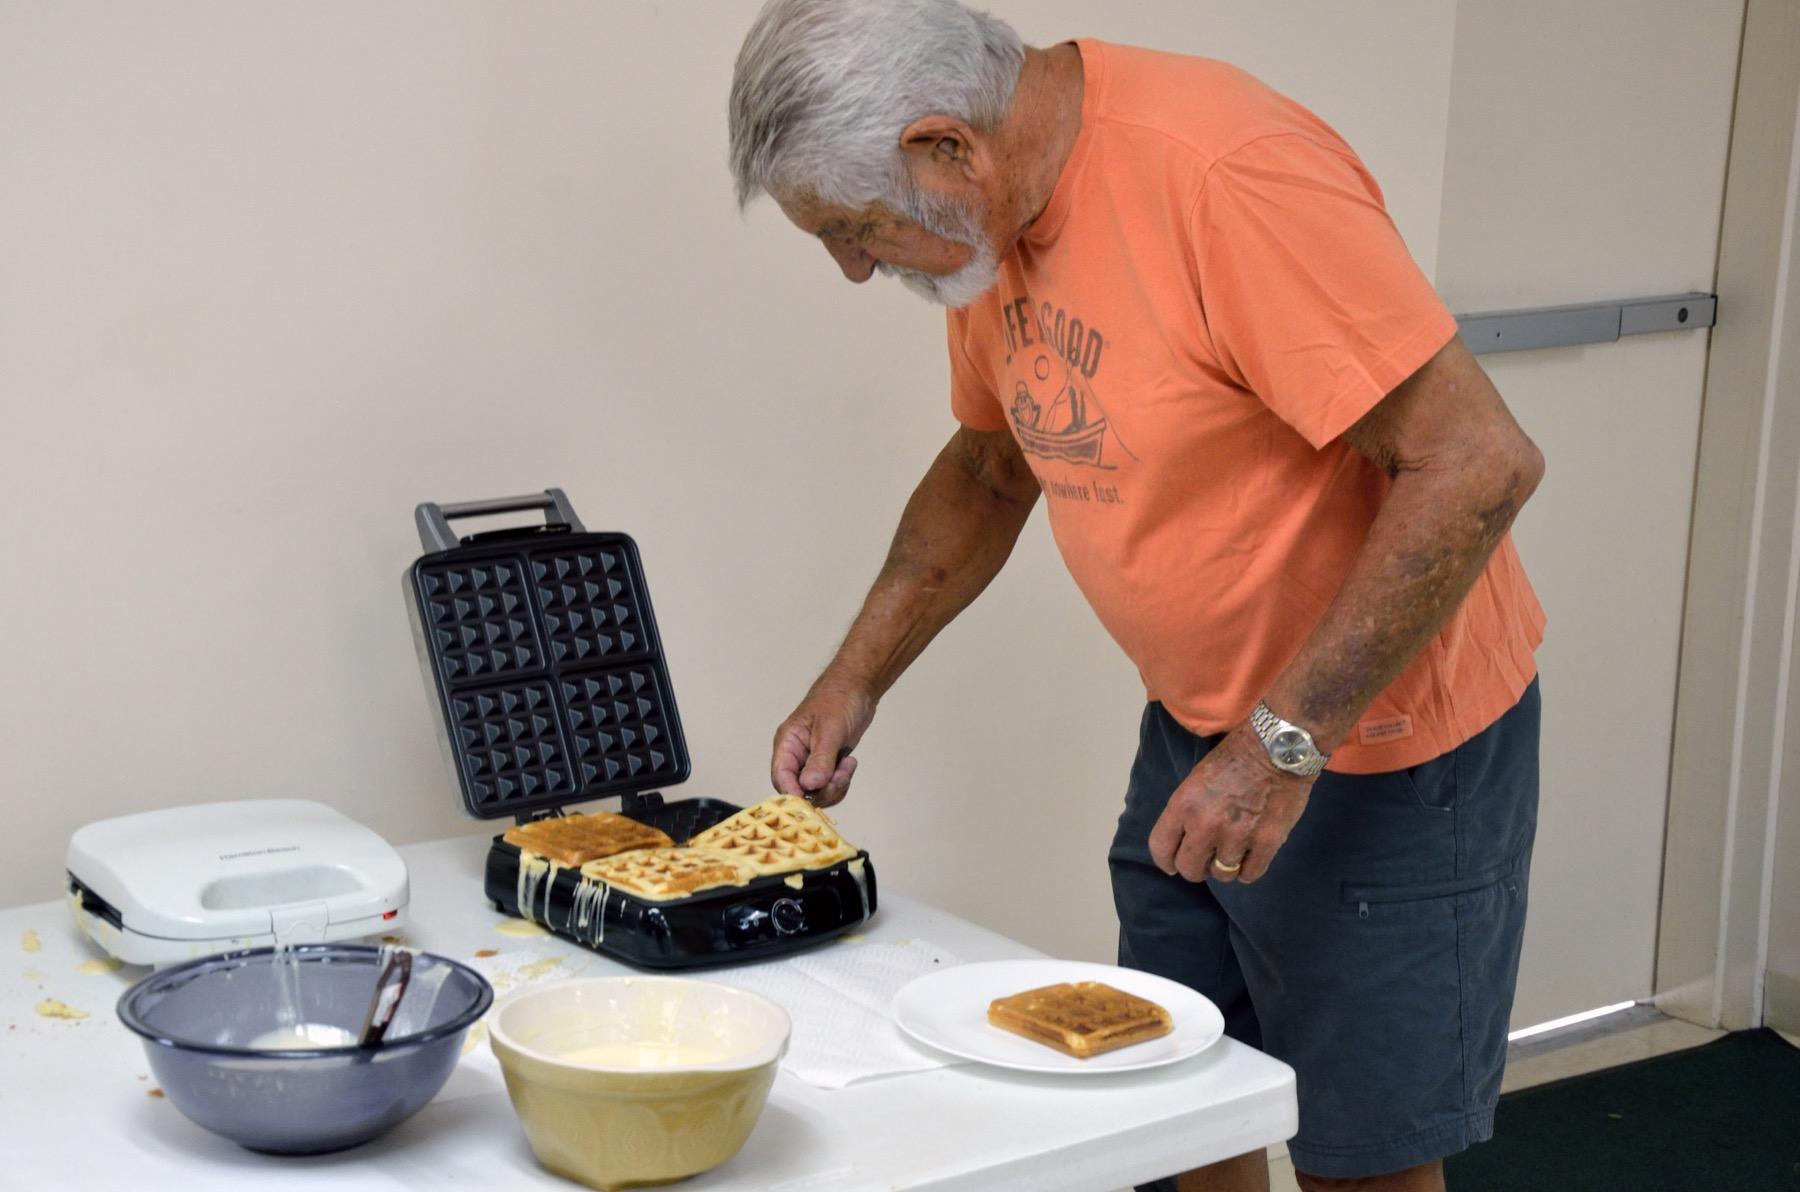 021-Art Fixing Morning Waffles